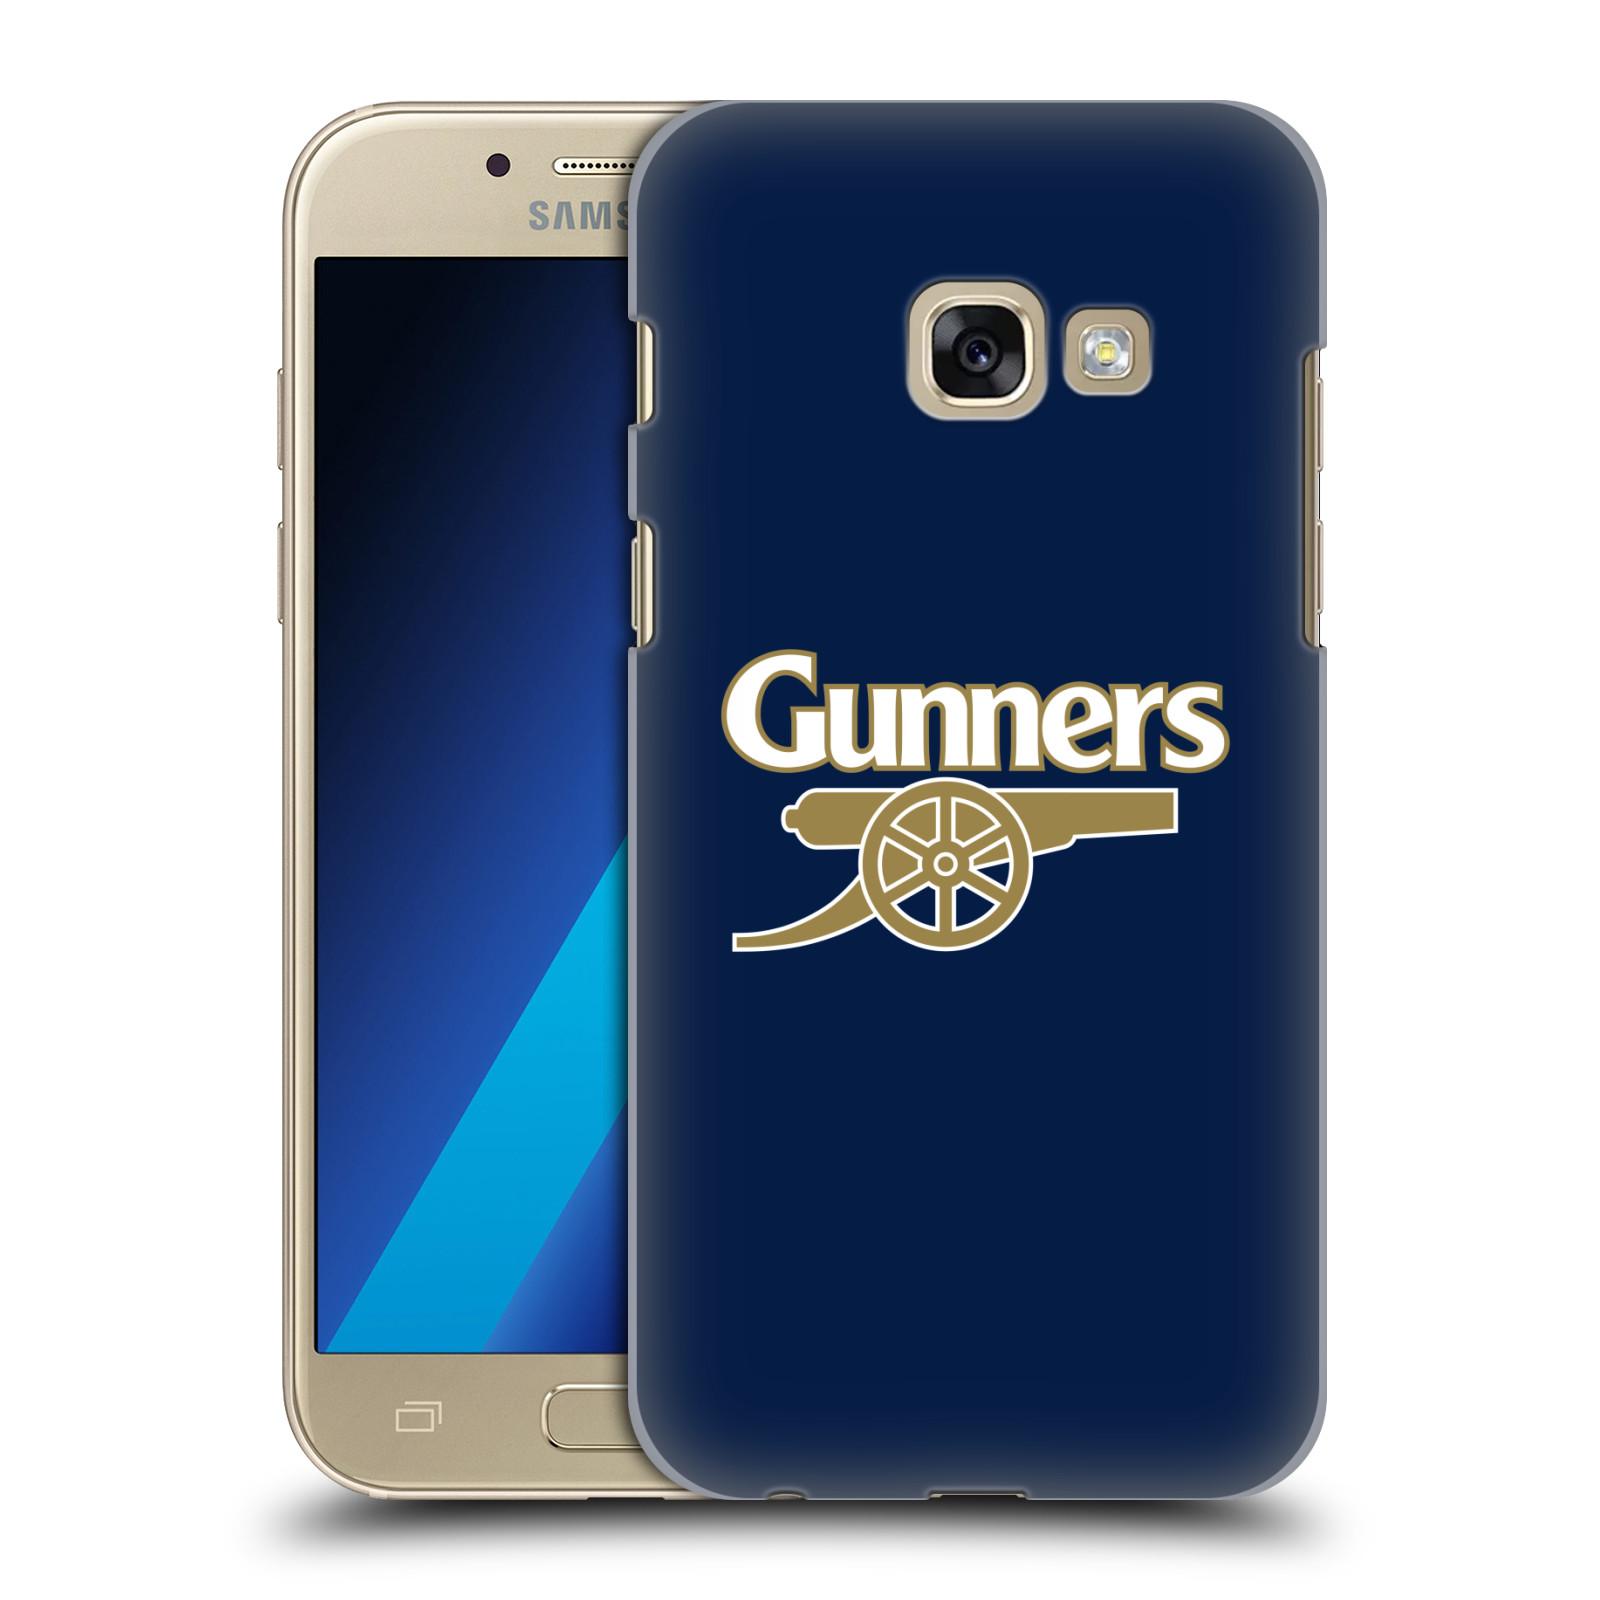 Plastové pouzdro na mobil Samsung Galaxy A3 (2017) - Head Case - Arsenal FC - Gunners